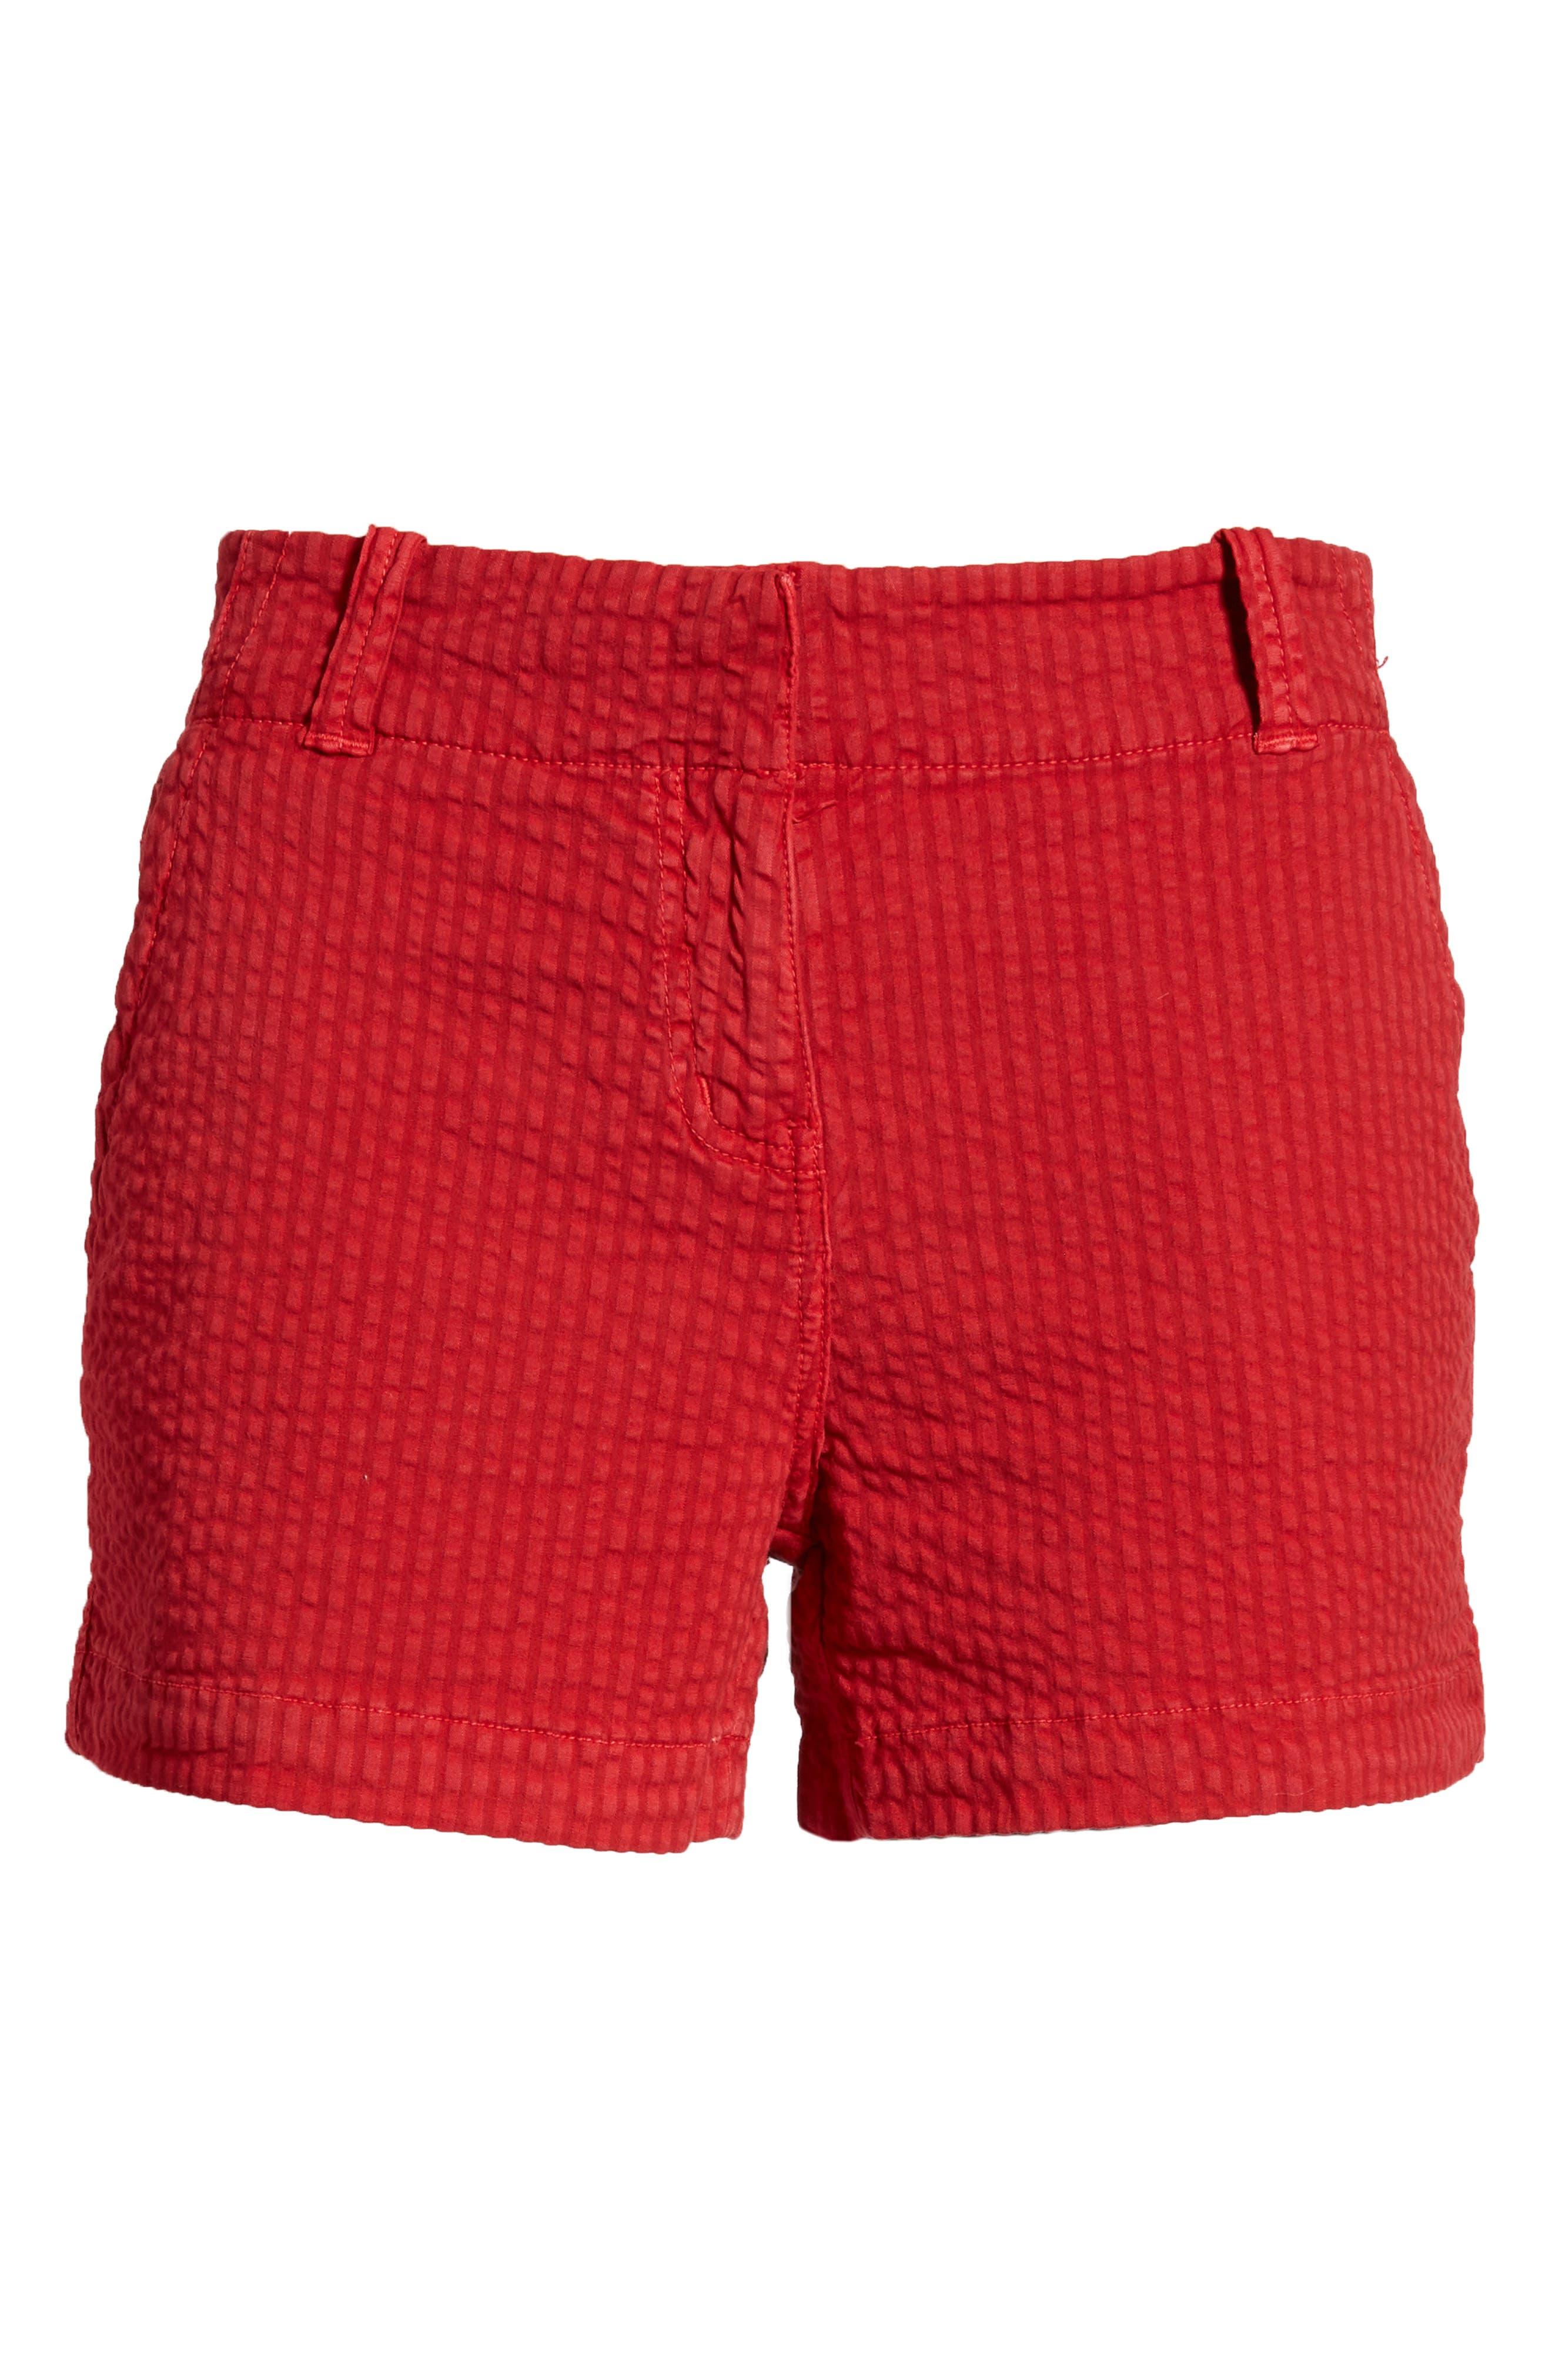 Everyday Seersucker Shorts,                             Alternate thumbnail 12, color,